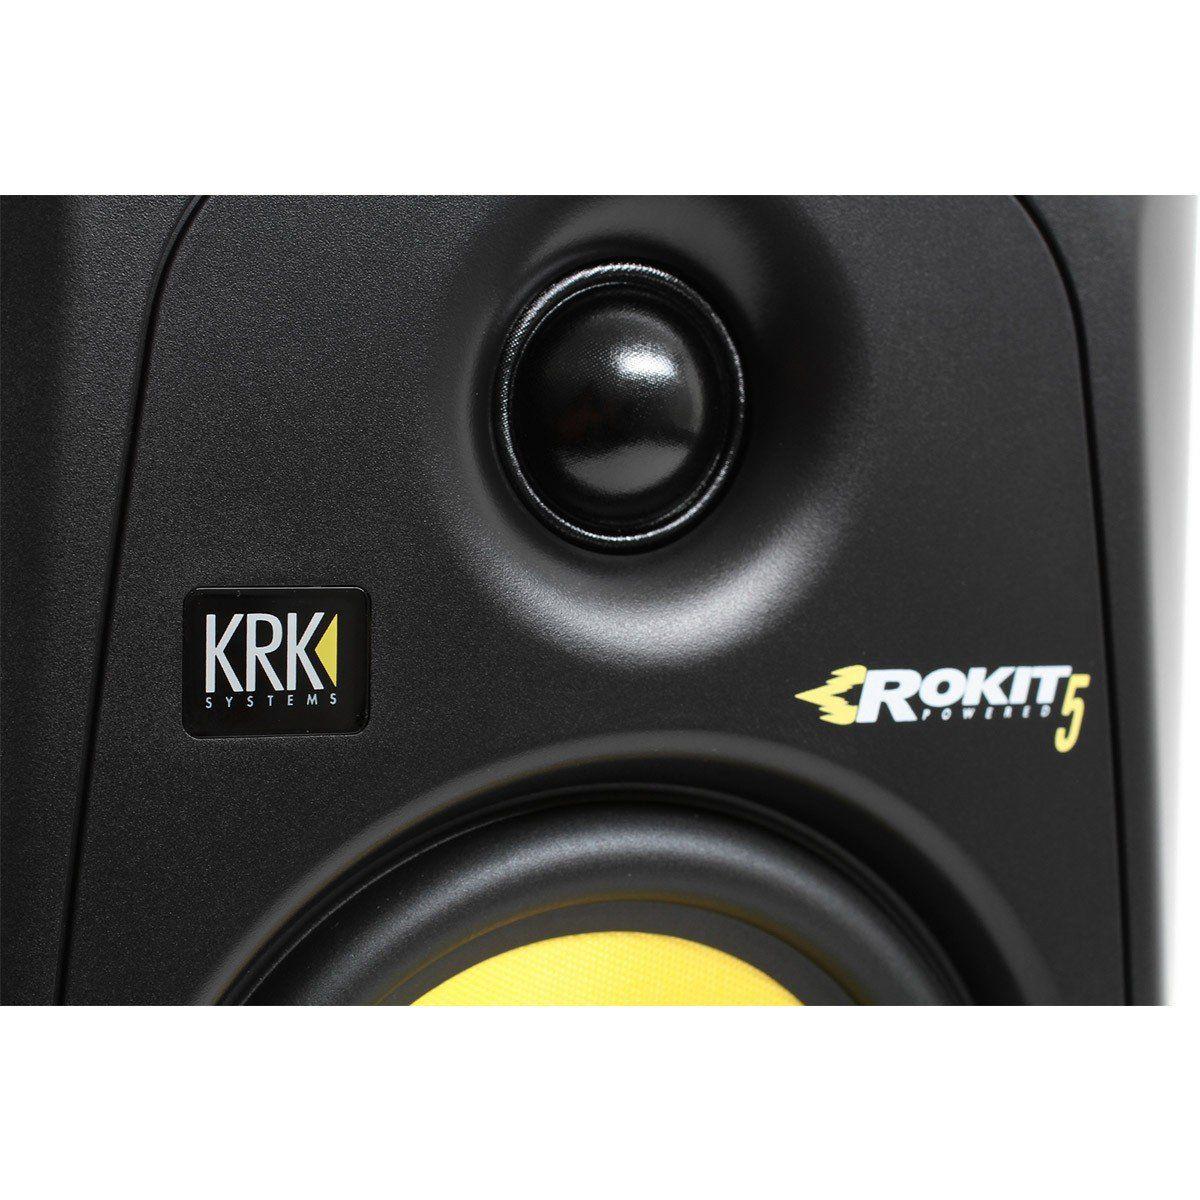 Krk RP5 G3 Rokit Monitor de Áudio Bi-amplificado Krk RP5G3-Rokit 50W de Potencia